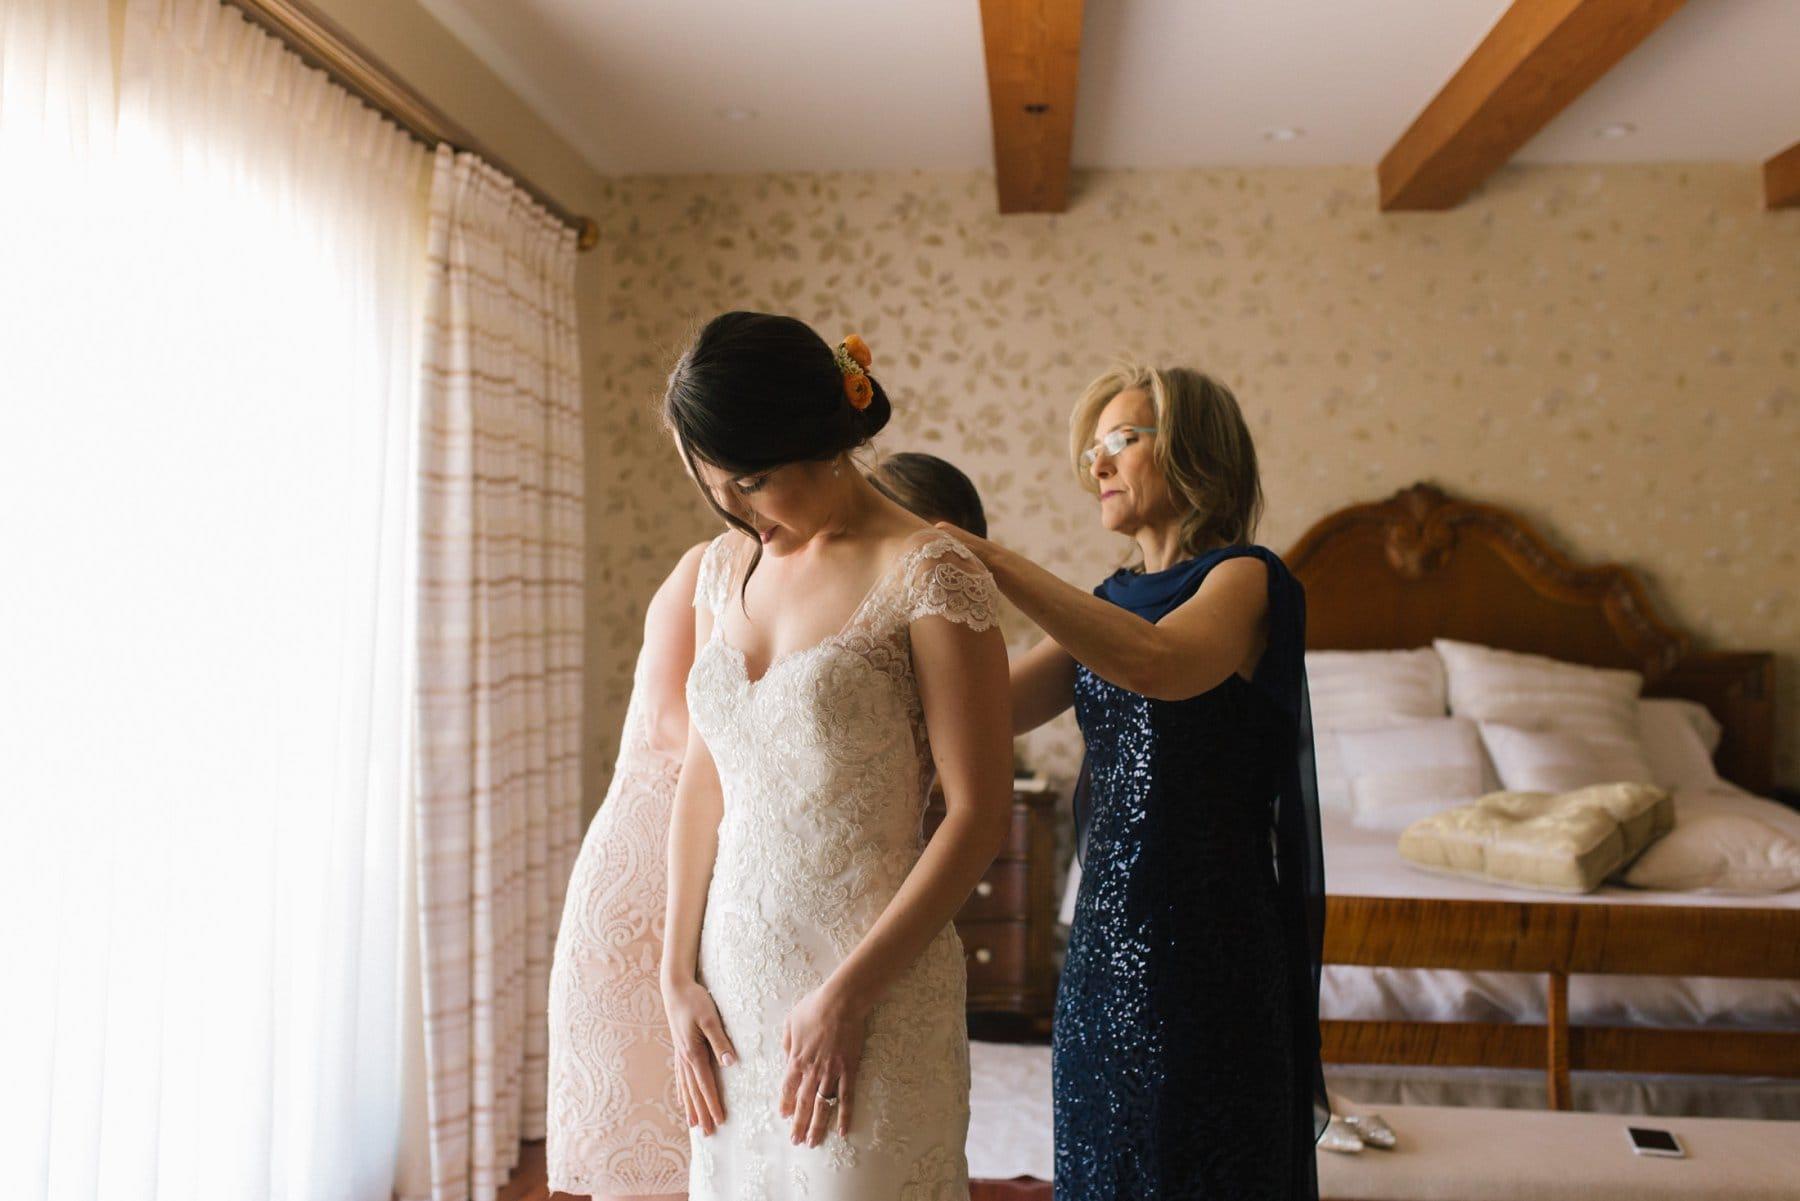 bride getting ready in a home Arizona wedding photographer